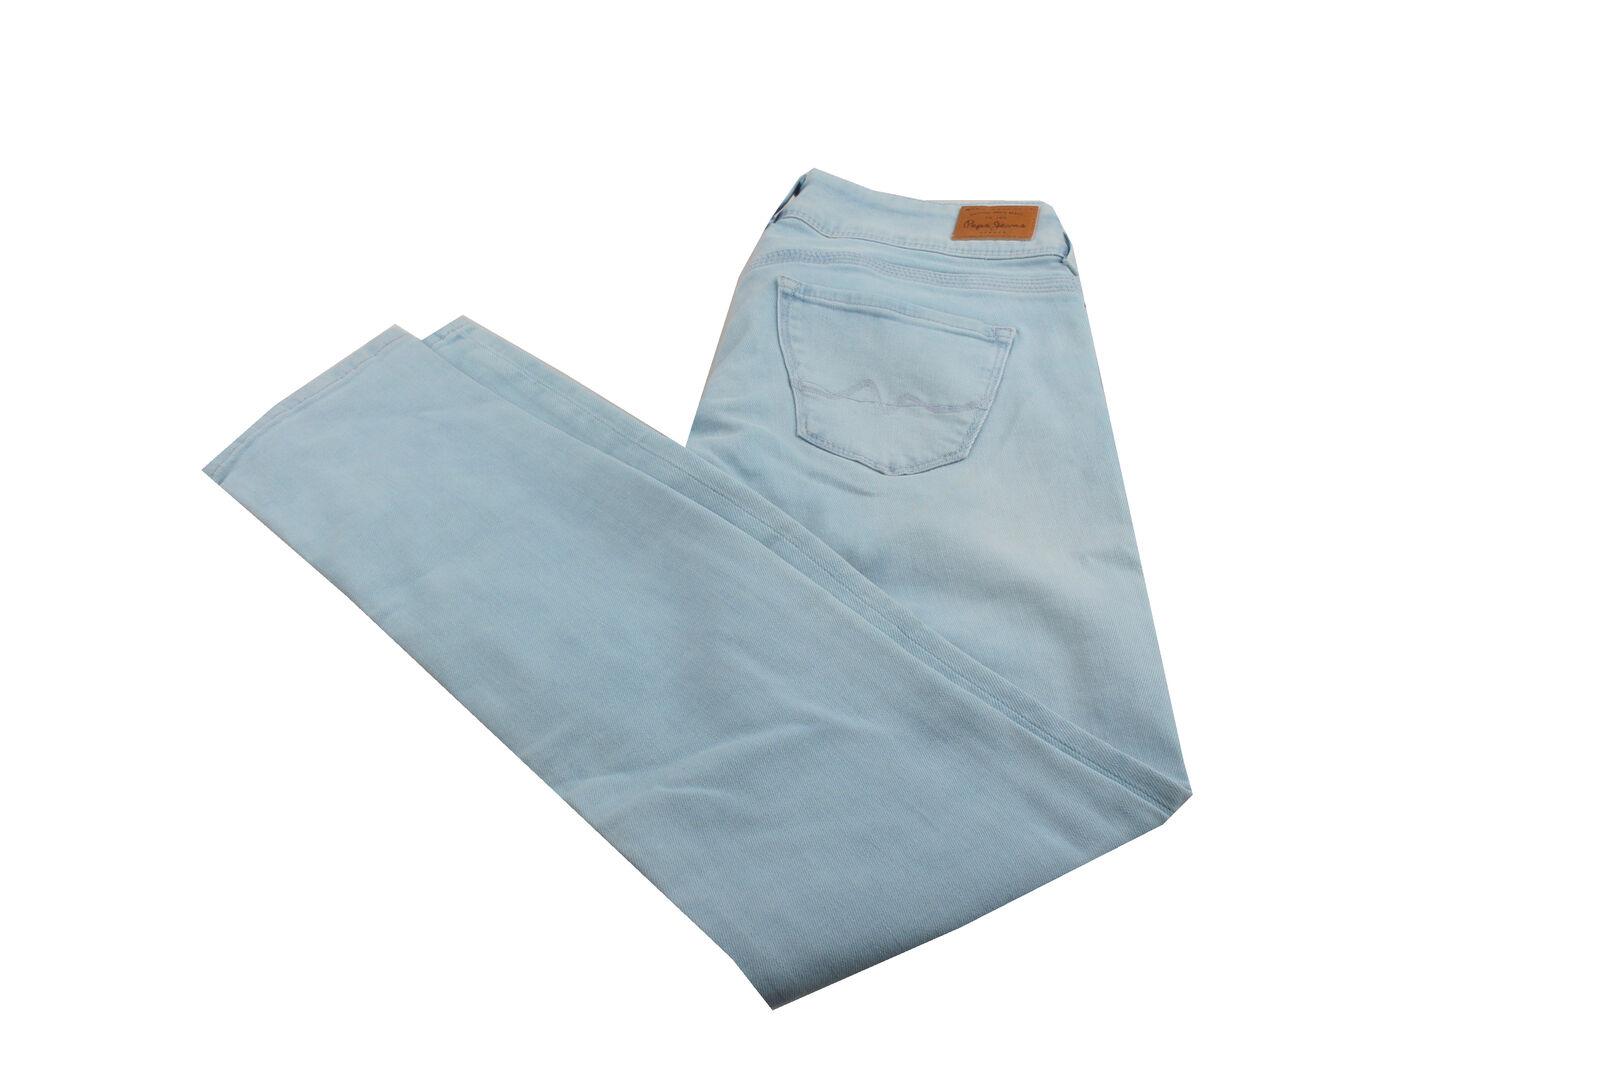 Pepe Jeans Vera Damen Jeans Hose Gr  28 30 hellblau Neu